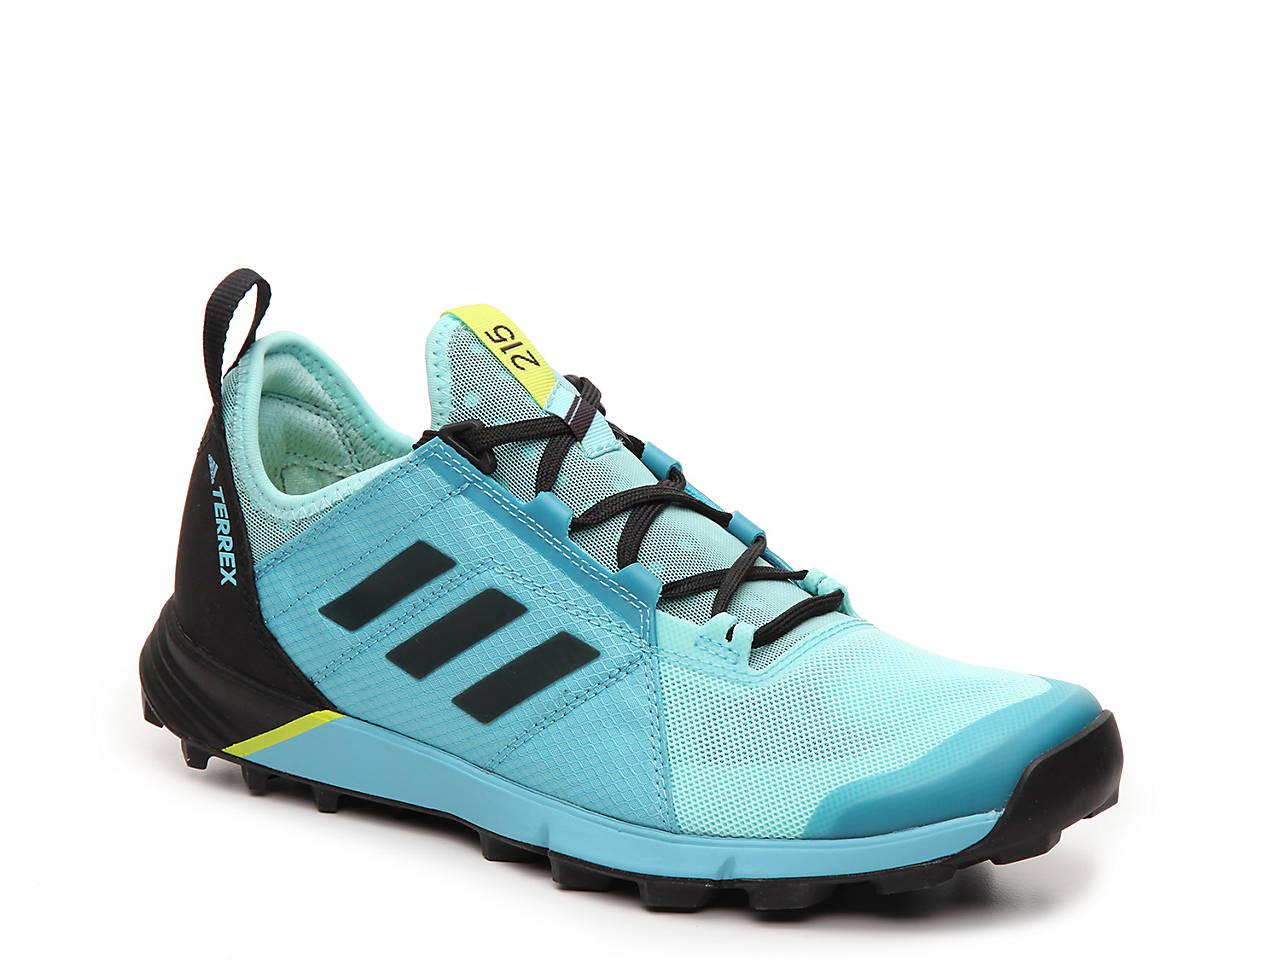 Adidas Terrex Agravic Trail Running Shoe Women's